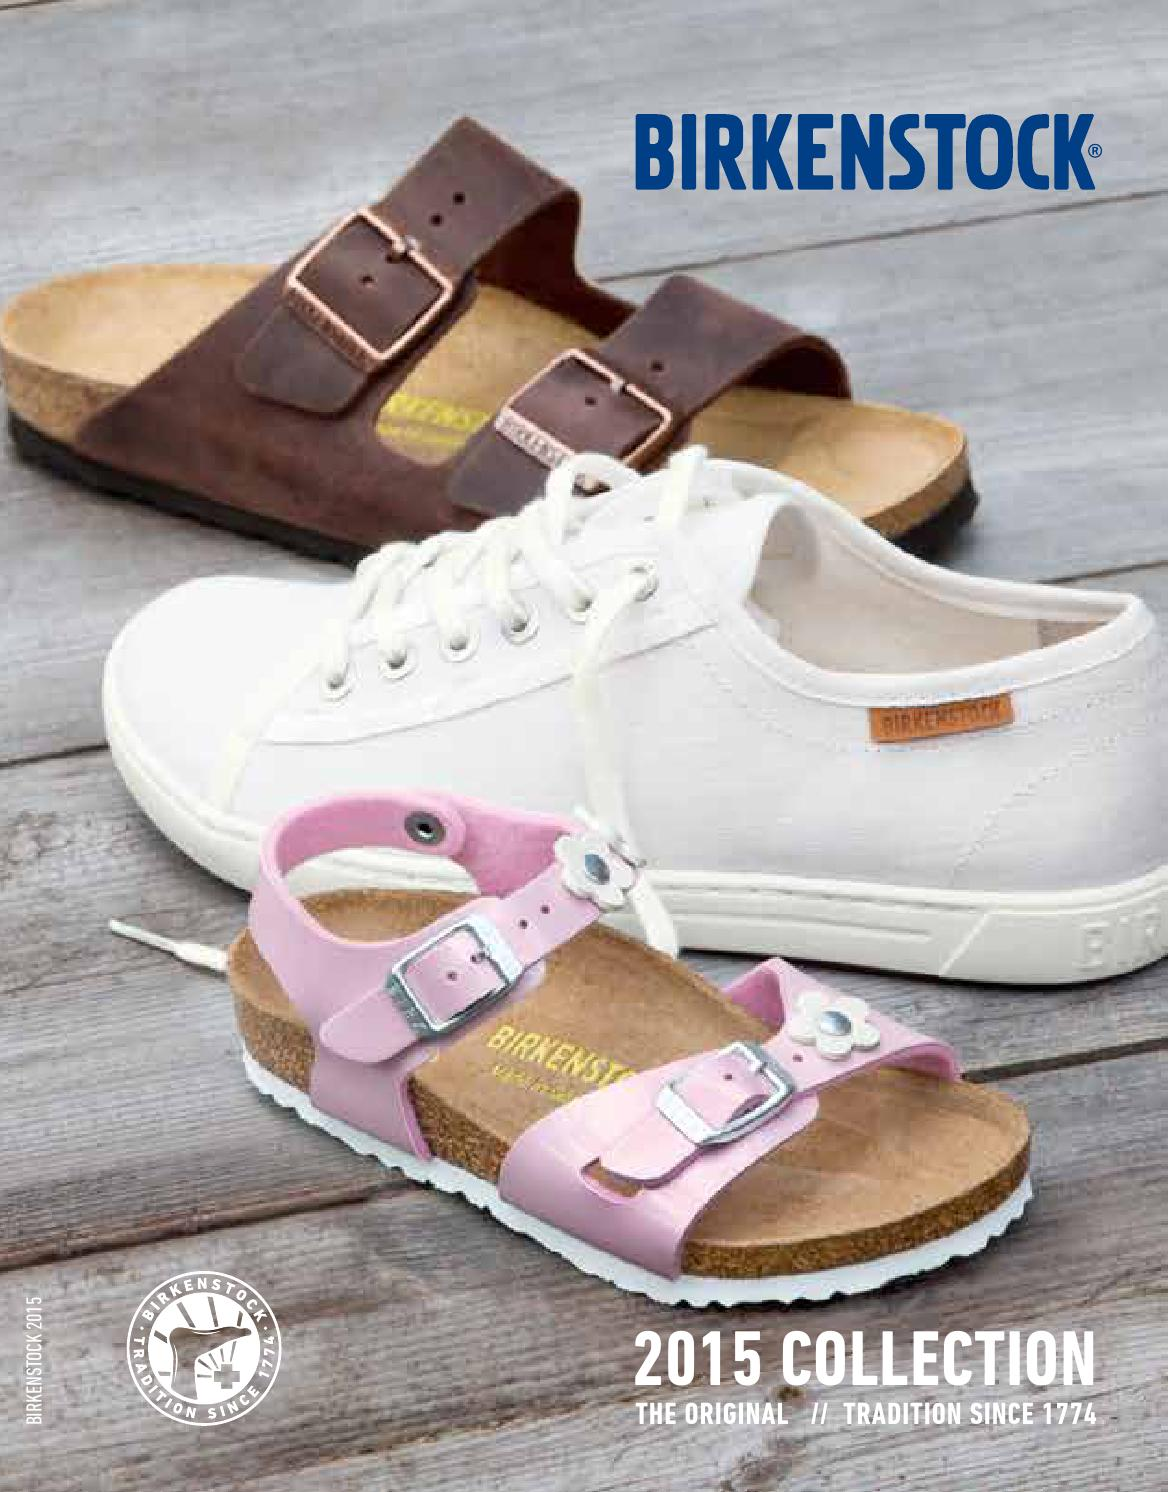 New! BIRKENSTOCK shoes model LINZ Gr. 36 wide normal black! | eBay